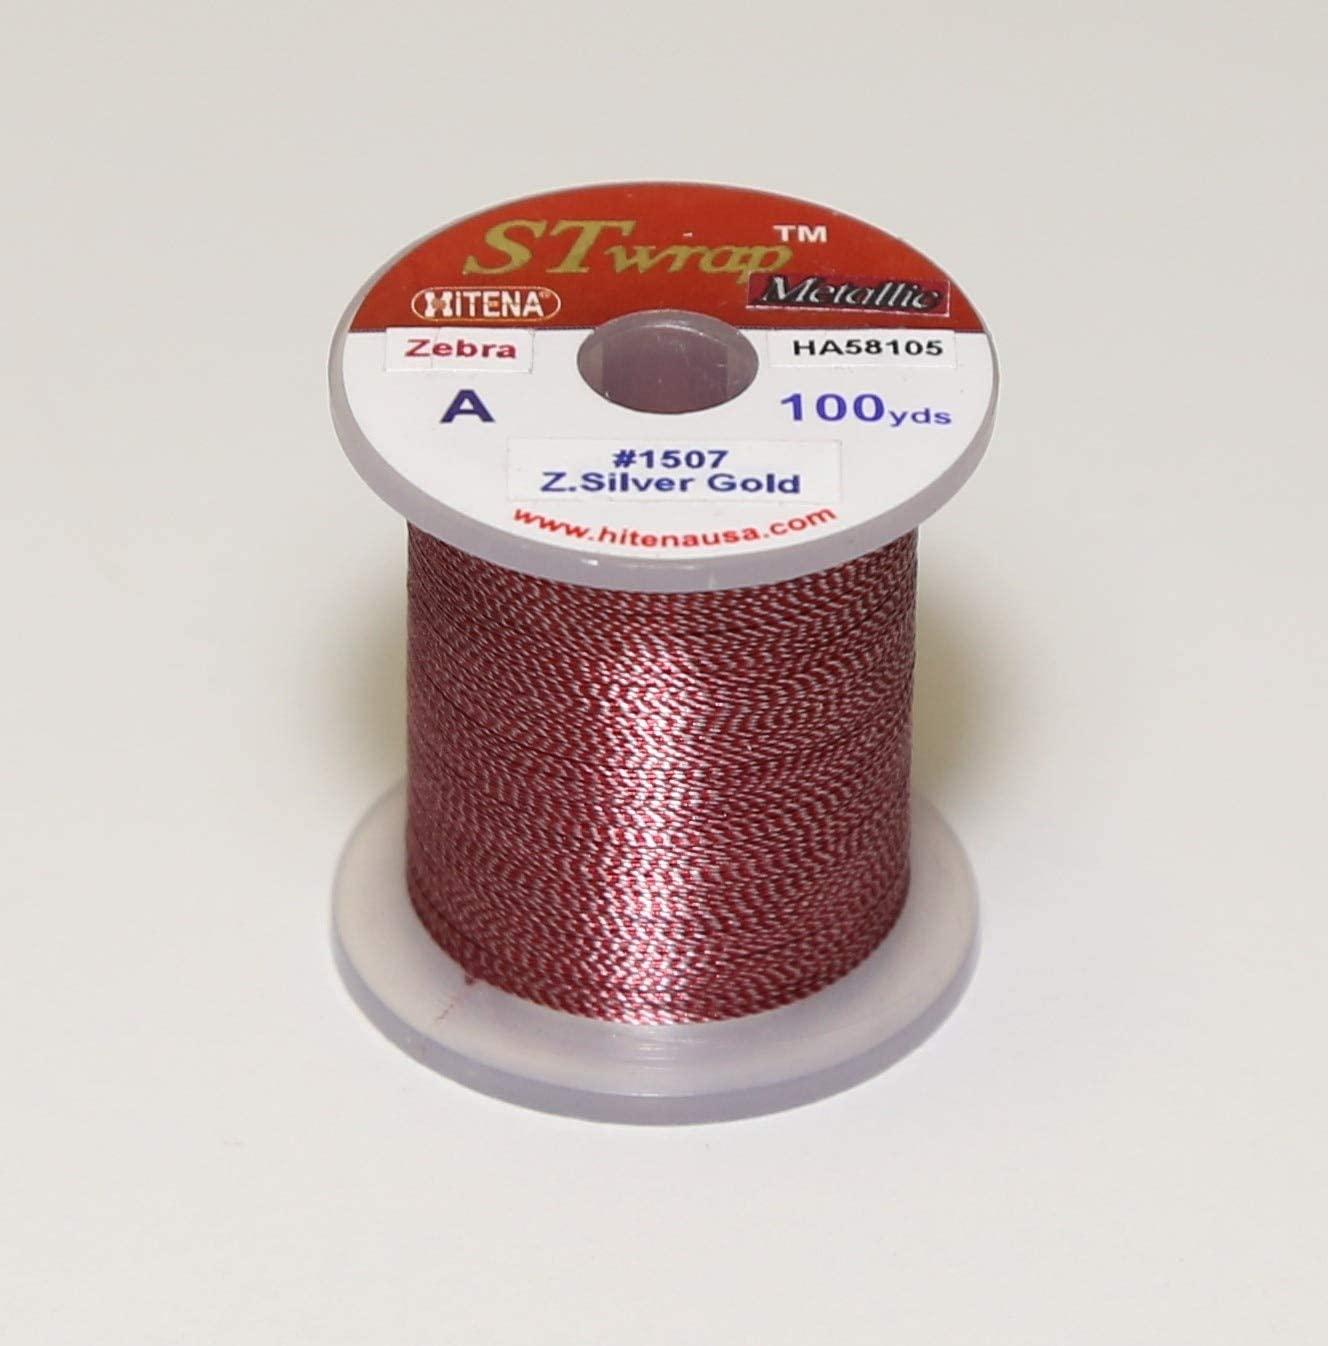 Hitena Rod Wrapping Thread - Metallic Zebra (Jasper) Winding Thread. 35 Colors Available